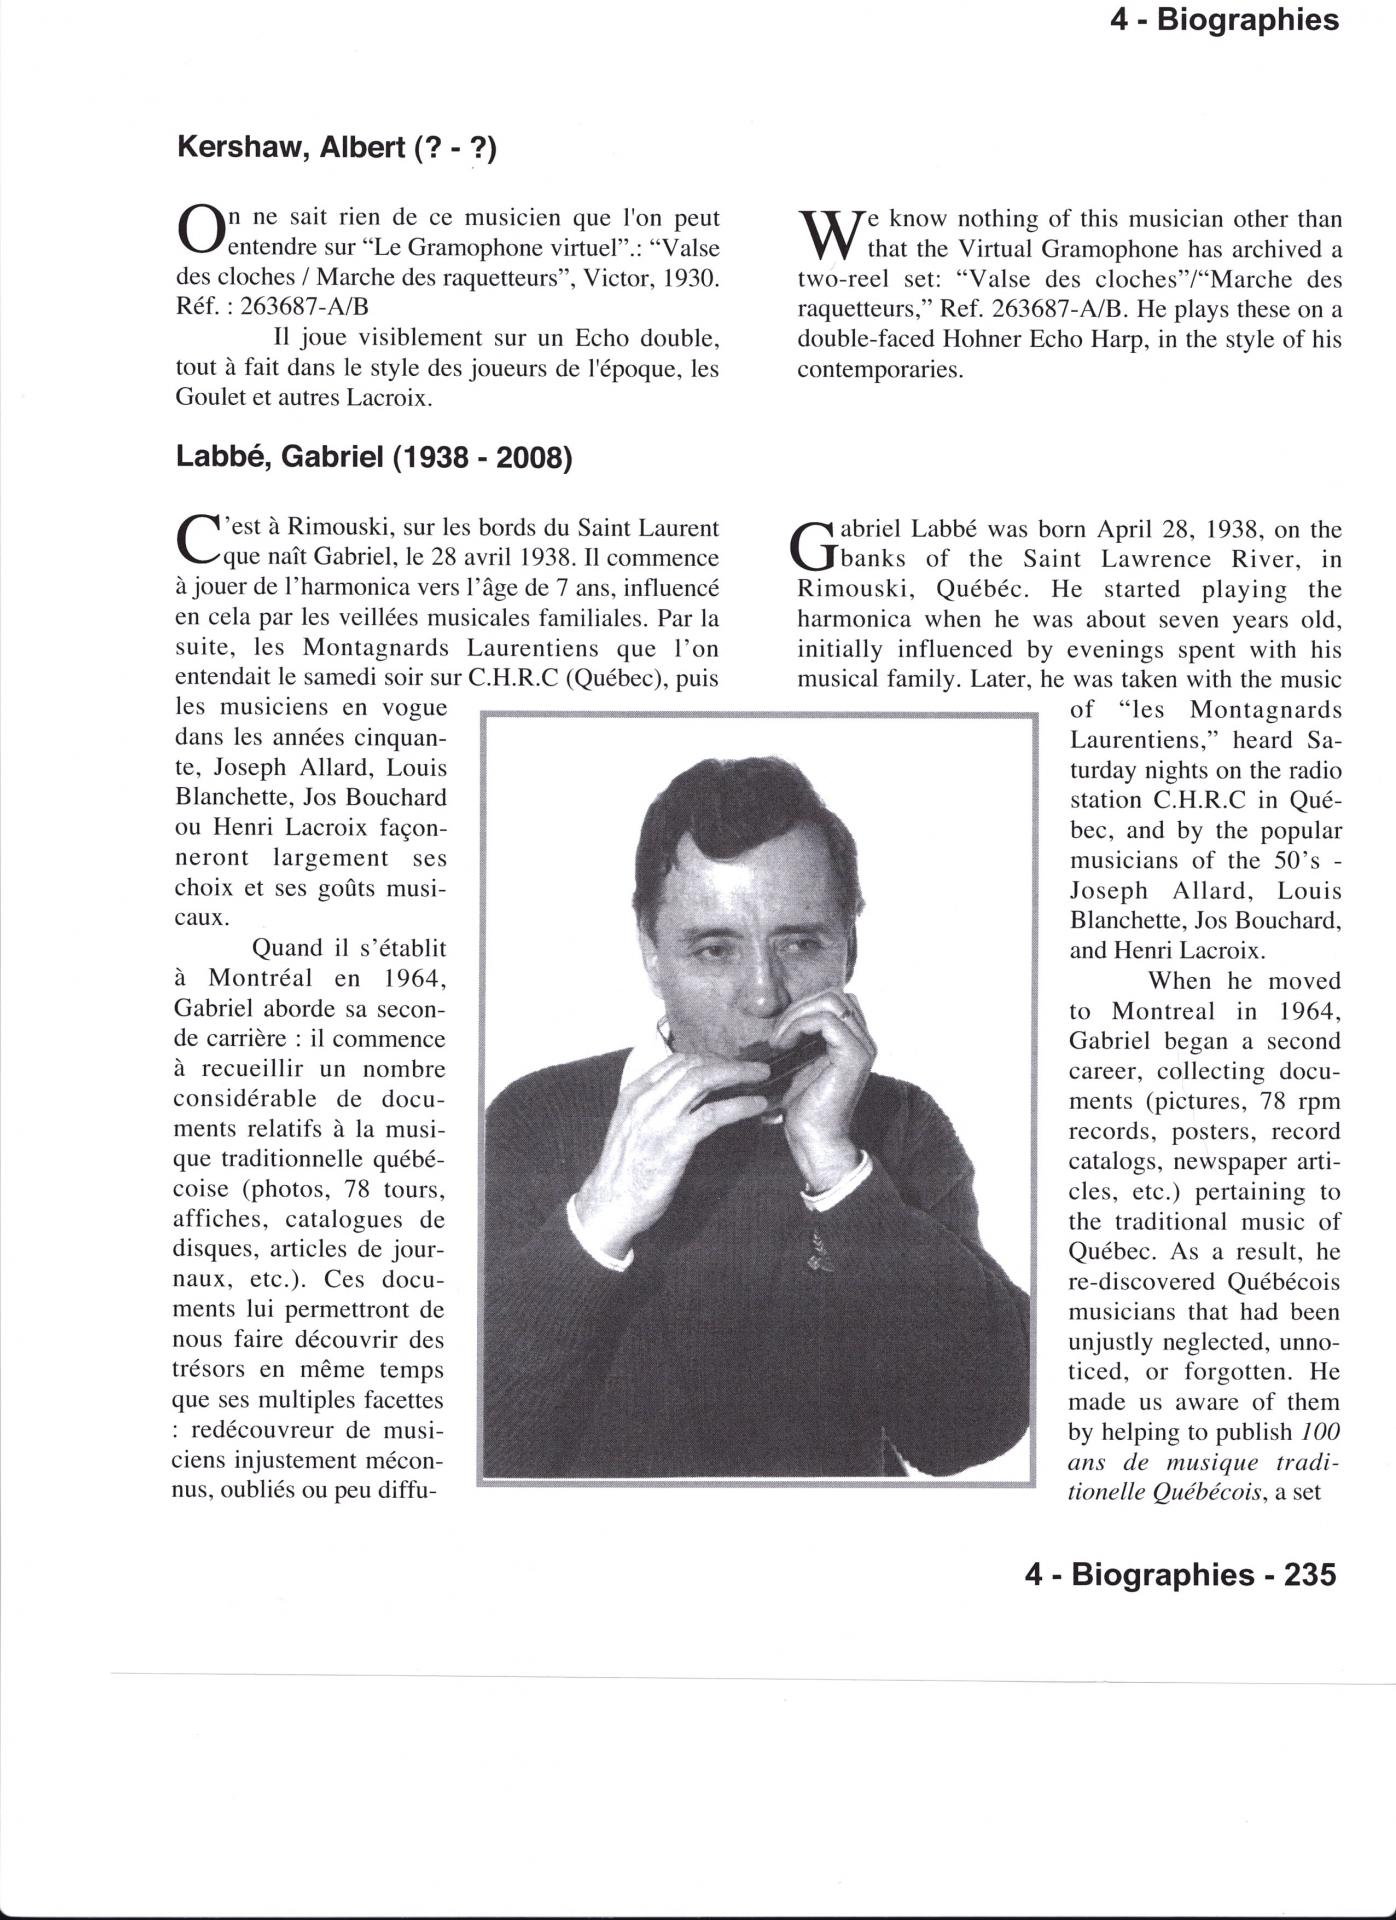 Livre bio gabriel p235